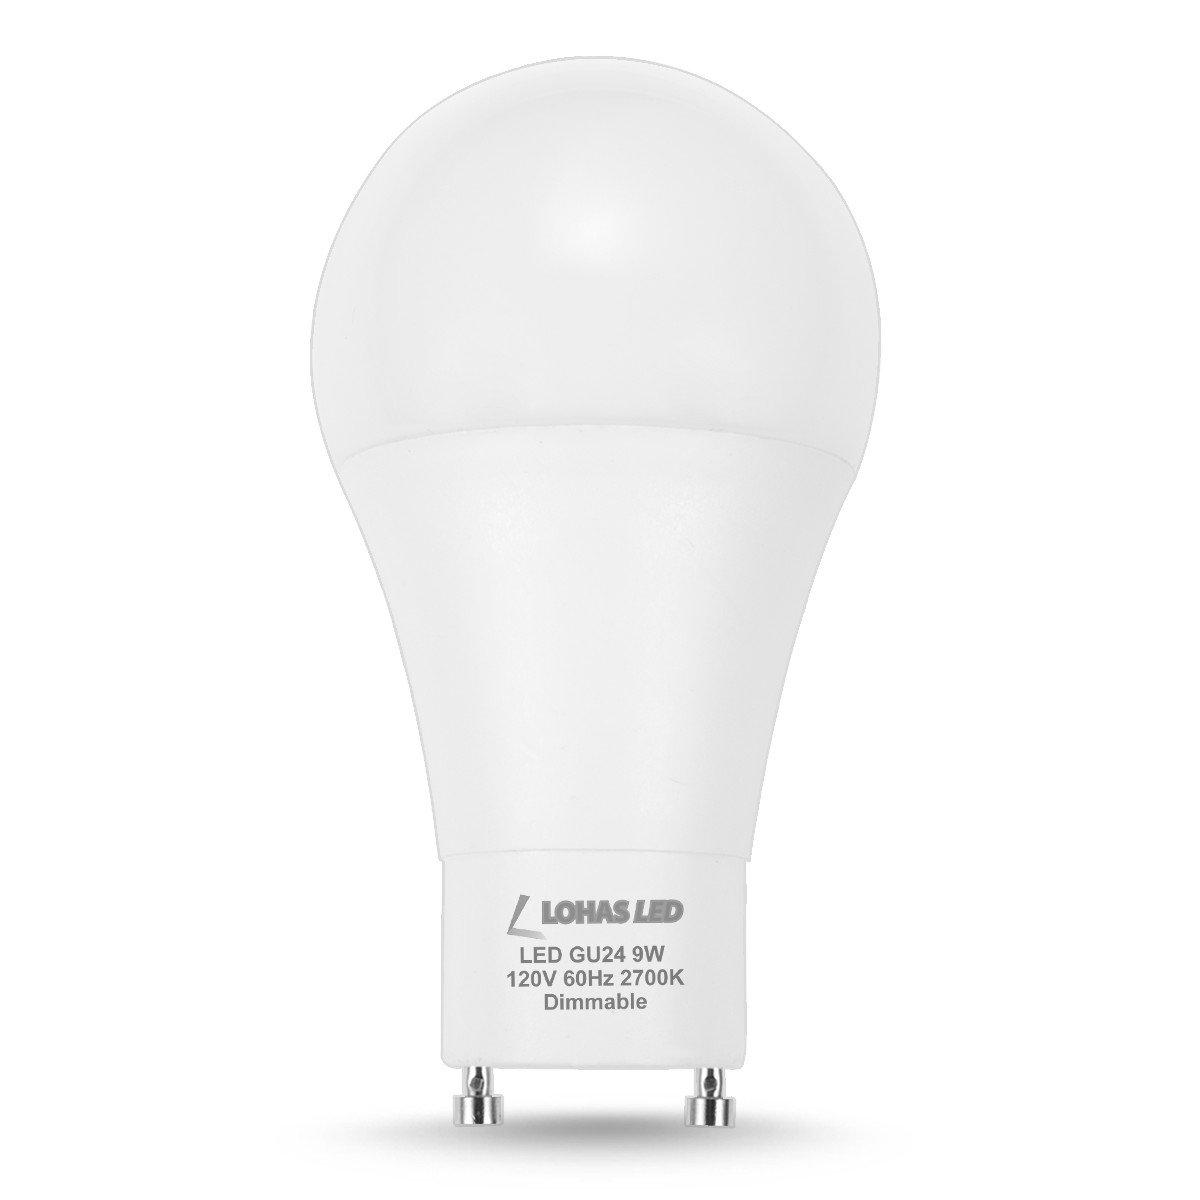 A19 LED Light Bulb GU24 Base 810LM LED Lamp 60 Watt Equivalent Warm White Lighting 2700K Replace CFL Light LOHAS GU24 Bulb 240 Degree Beam Angle 9W LED 4 Pack